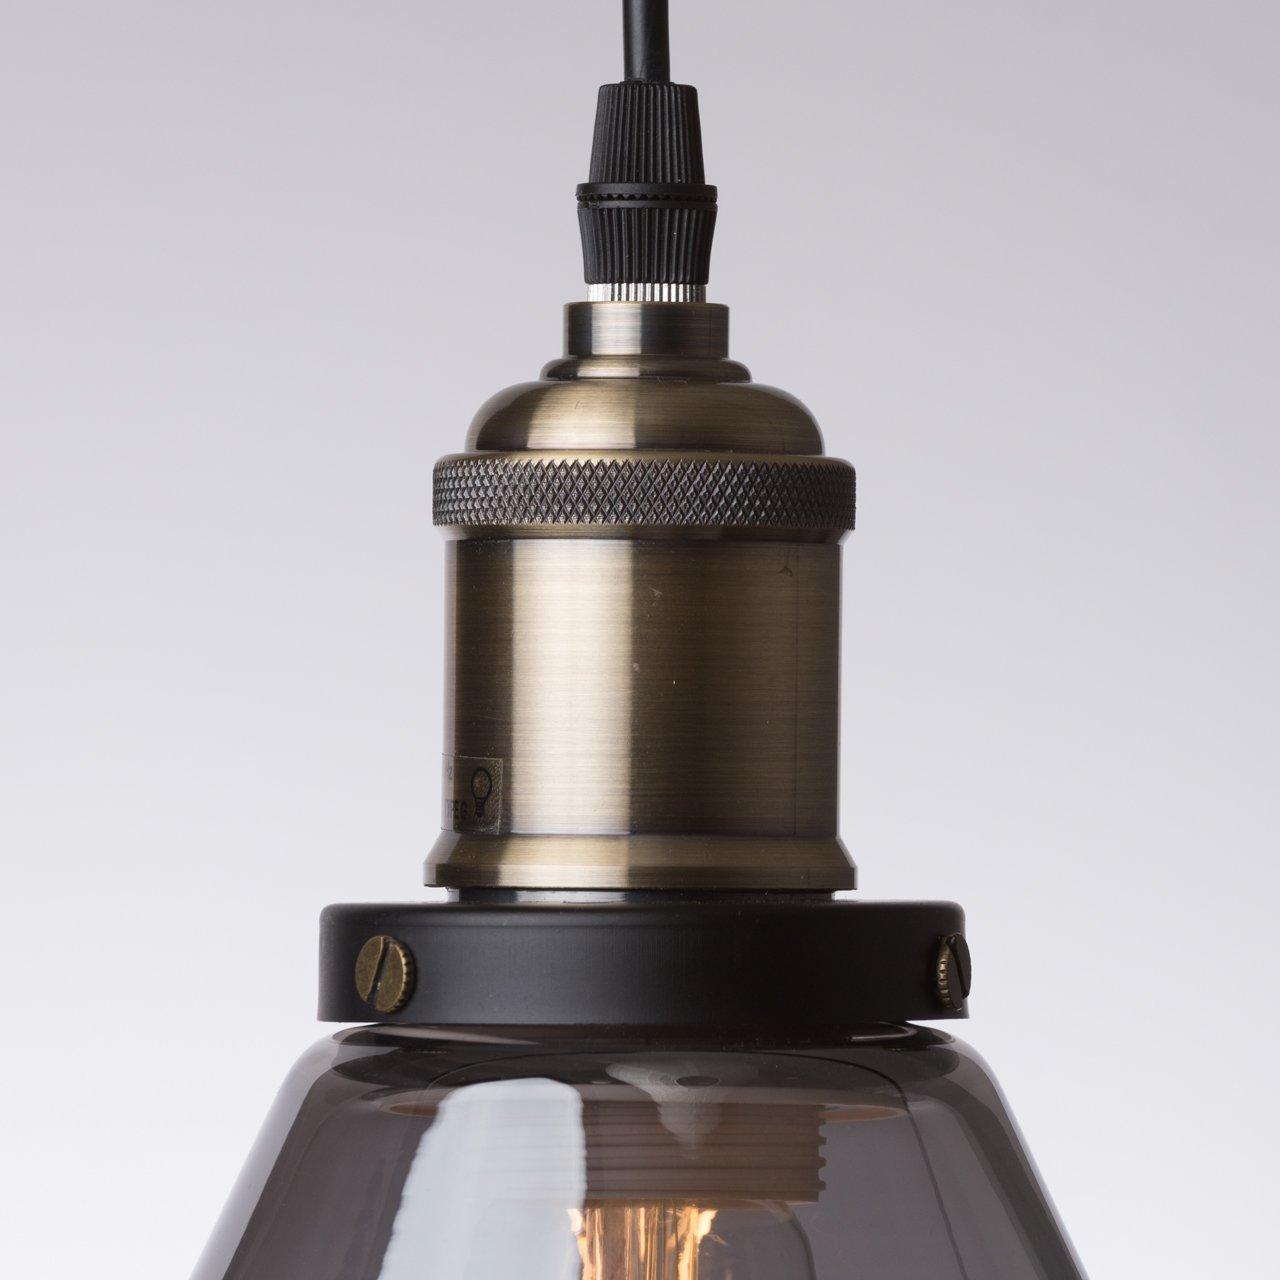 Ledmasters Smoked Glass Pendant Light Vintage Retro Industrial Ceiling